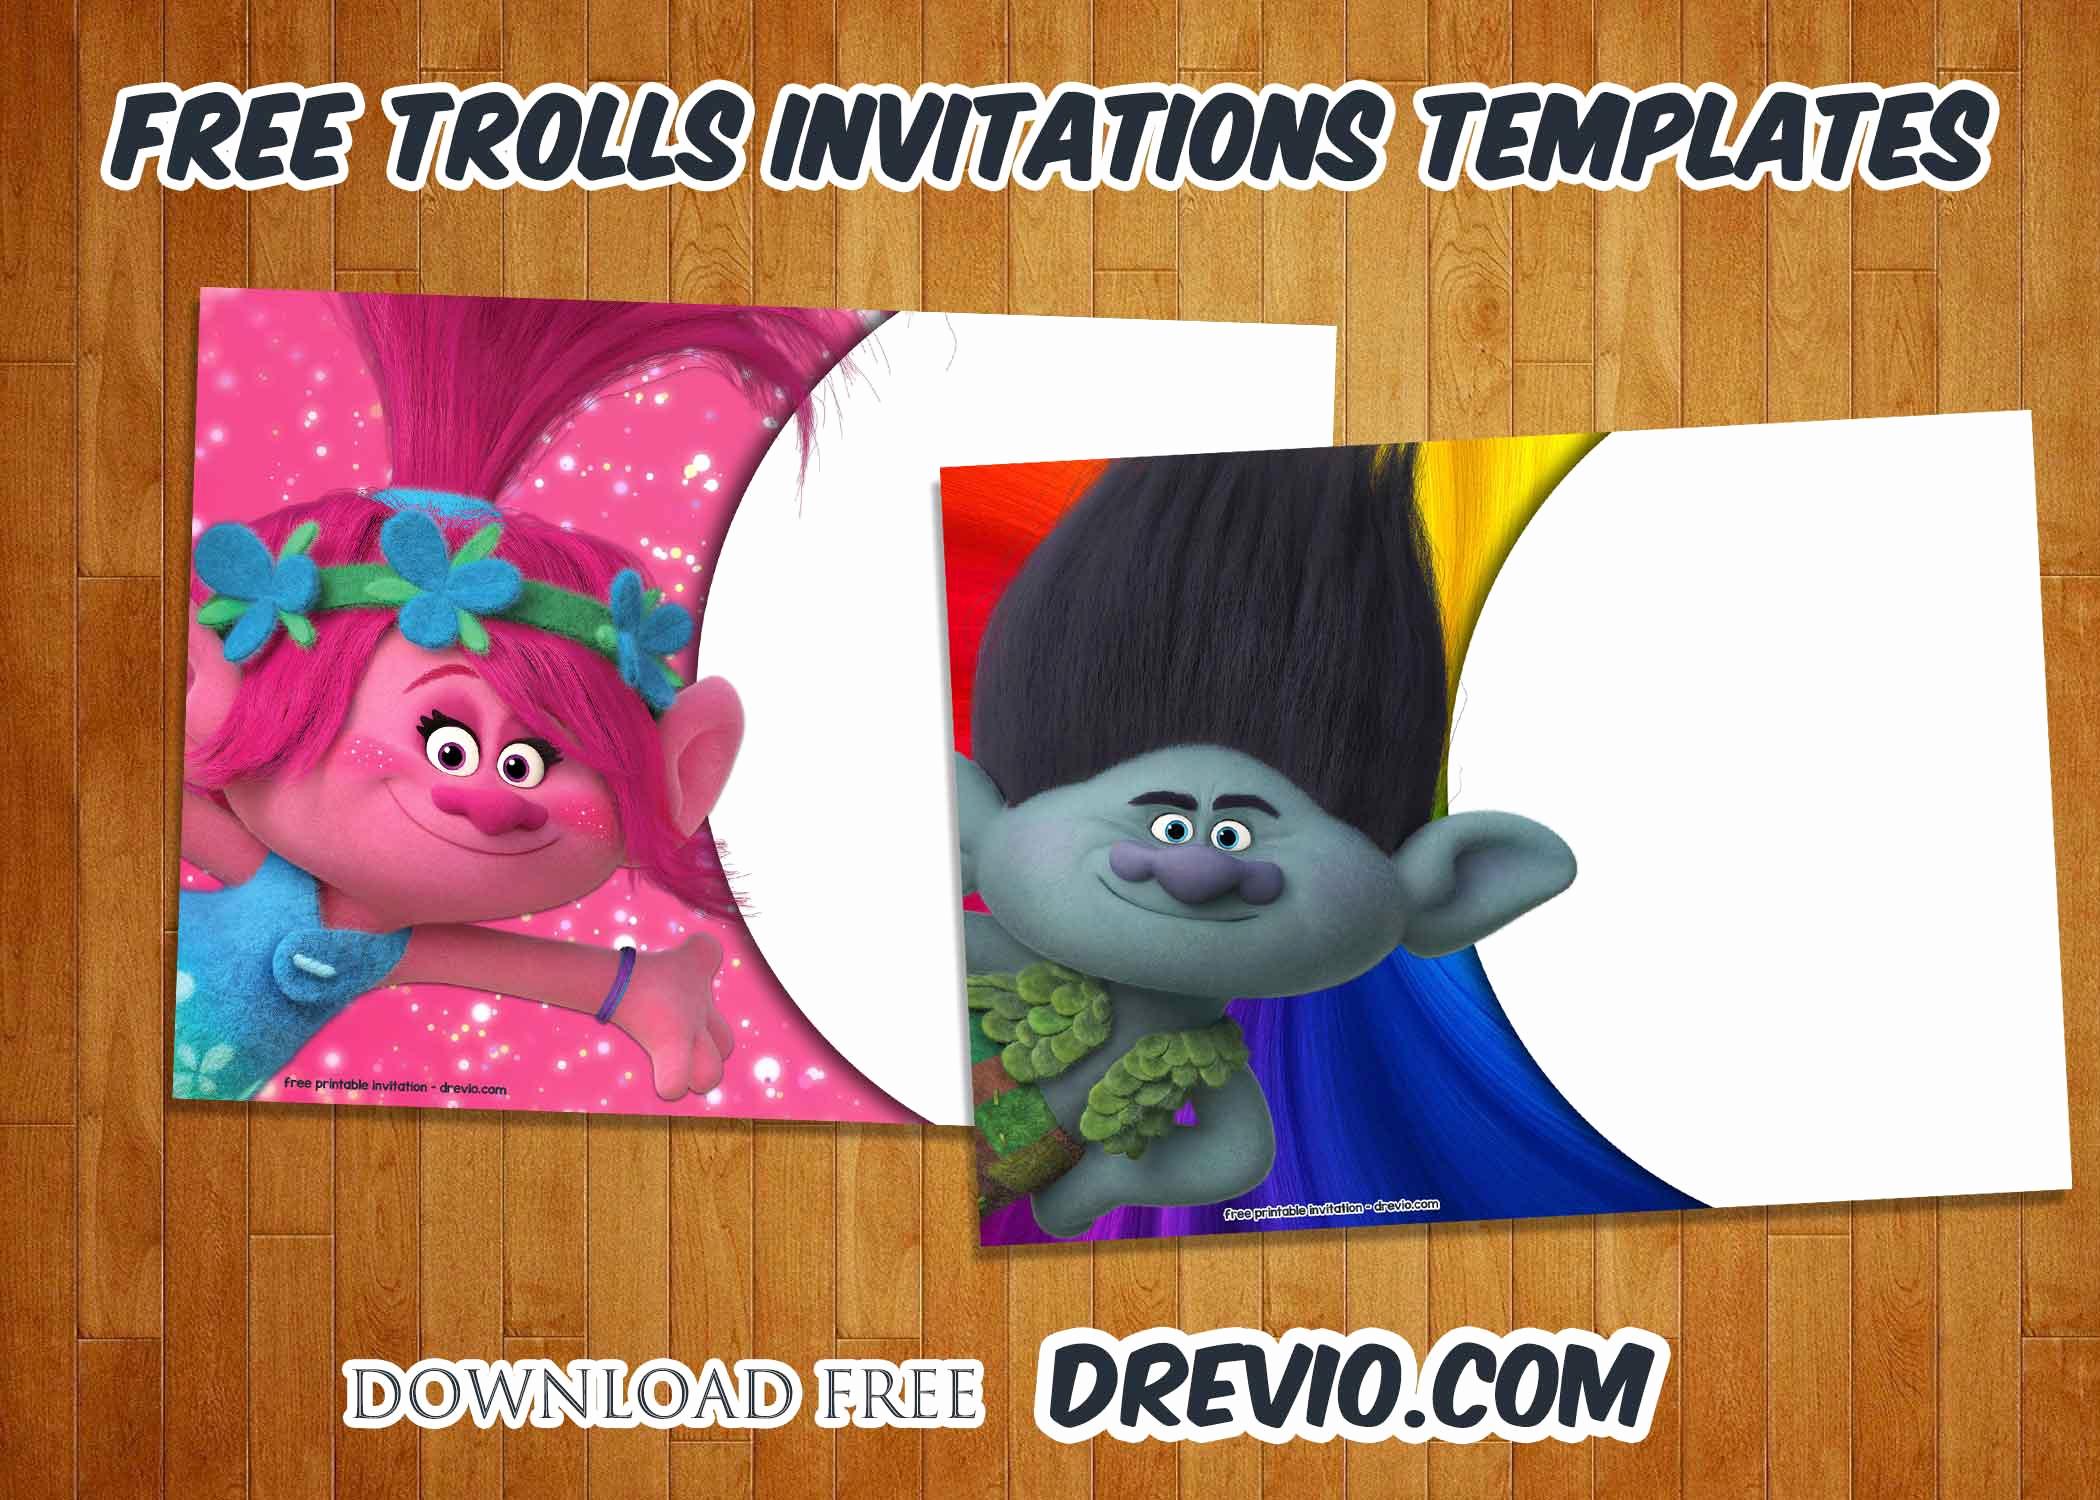 Trolls Invitation Template Free Luxury Free Trolls Birthday Invitations Templates